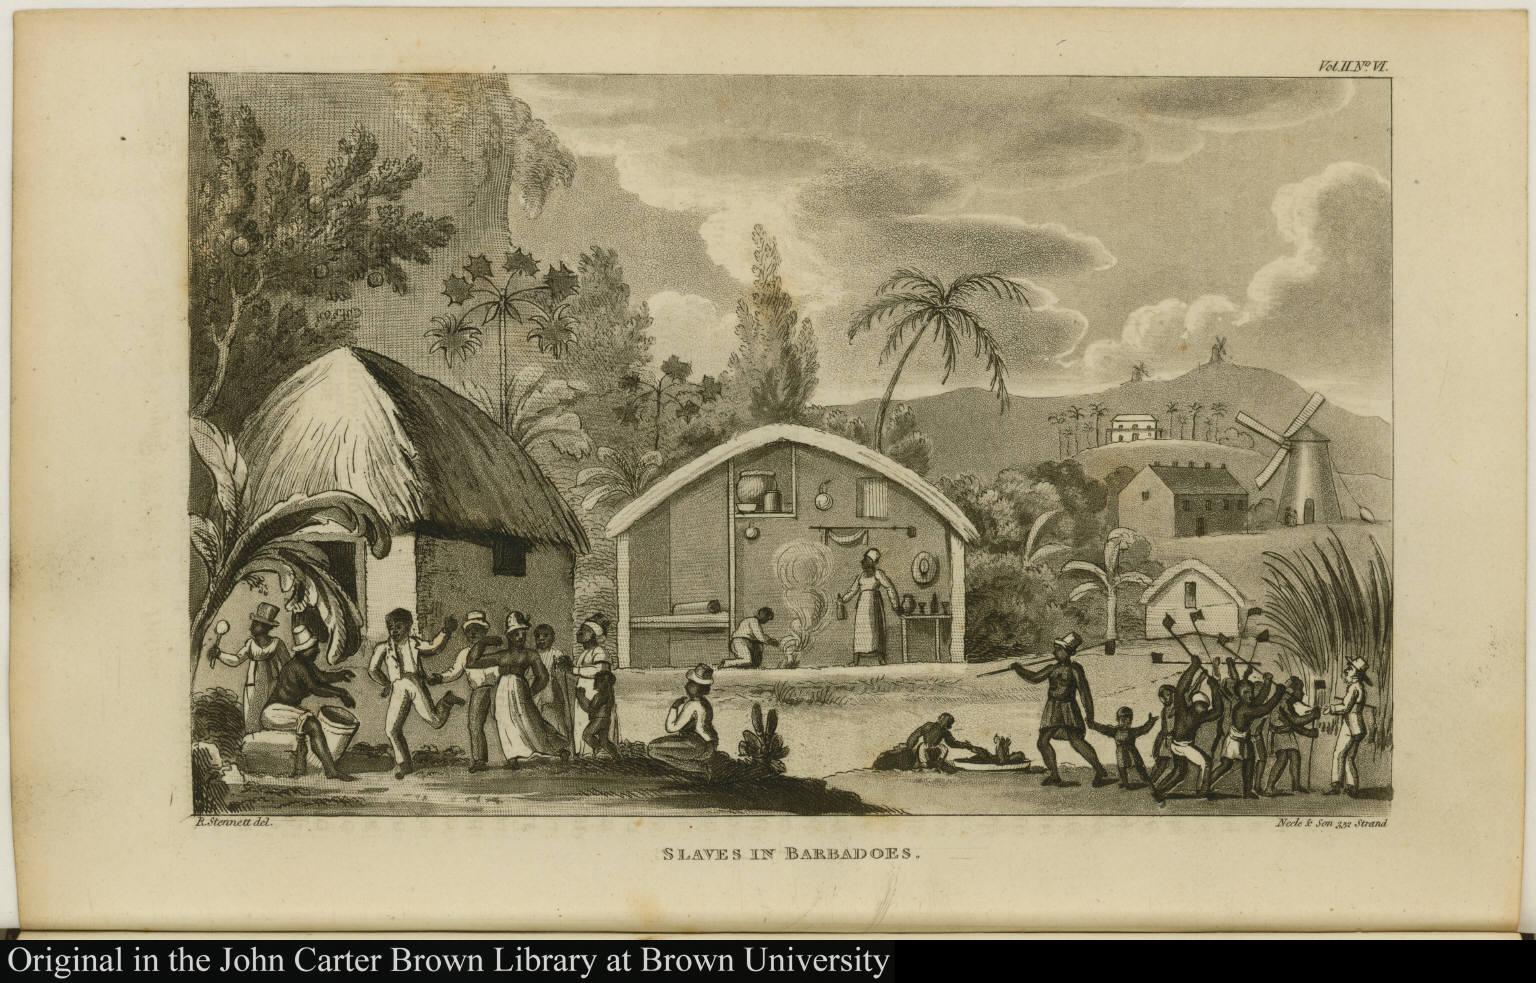 Slaves in Barbadoes.